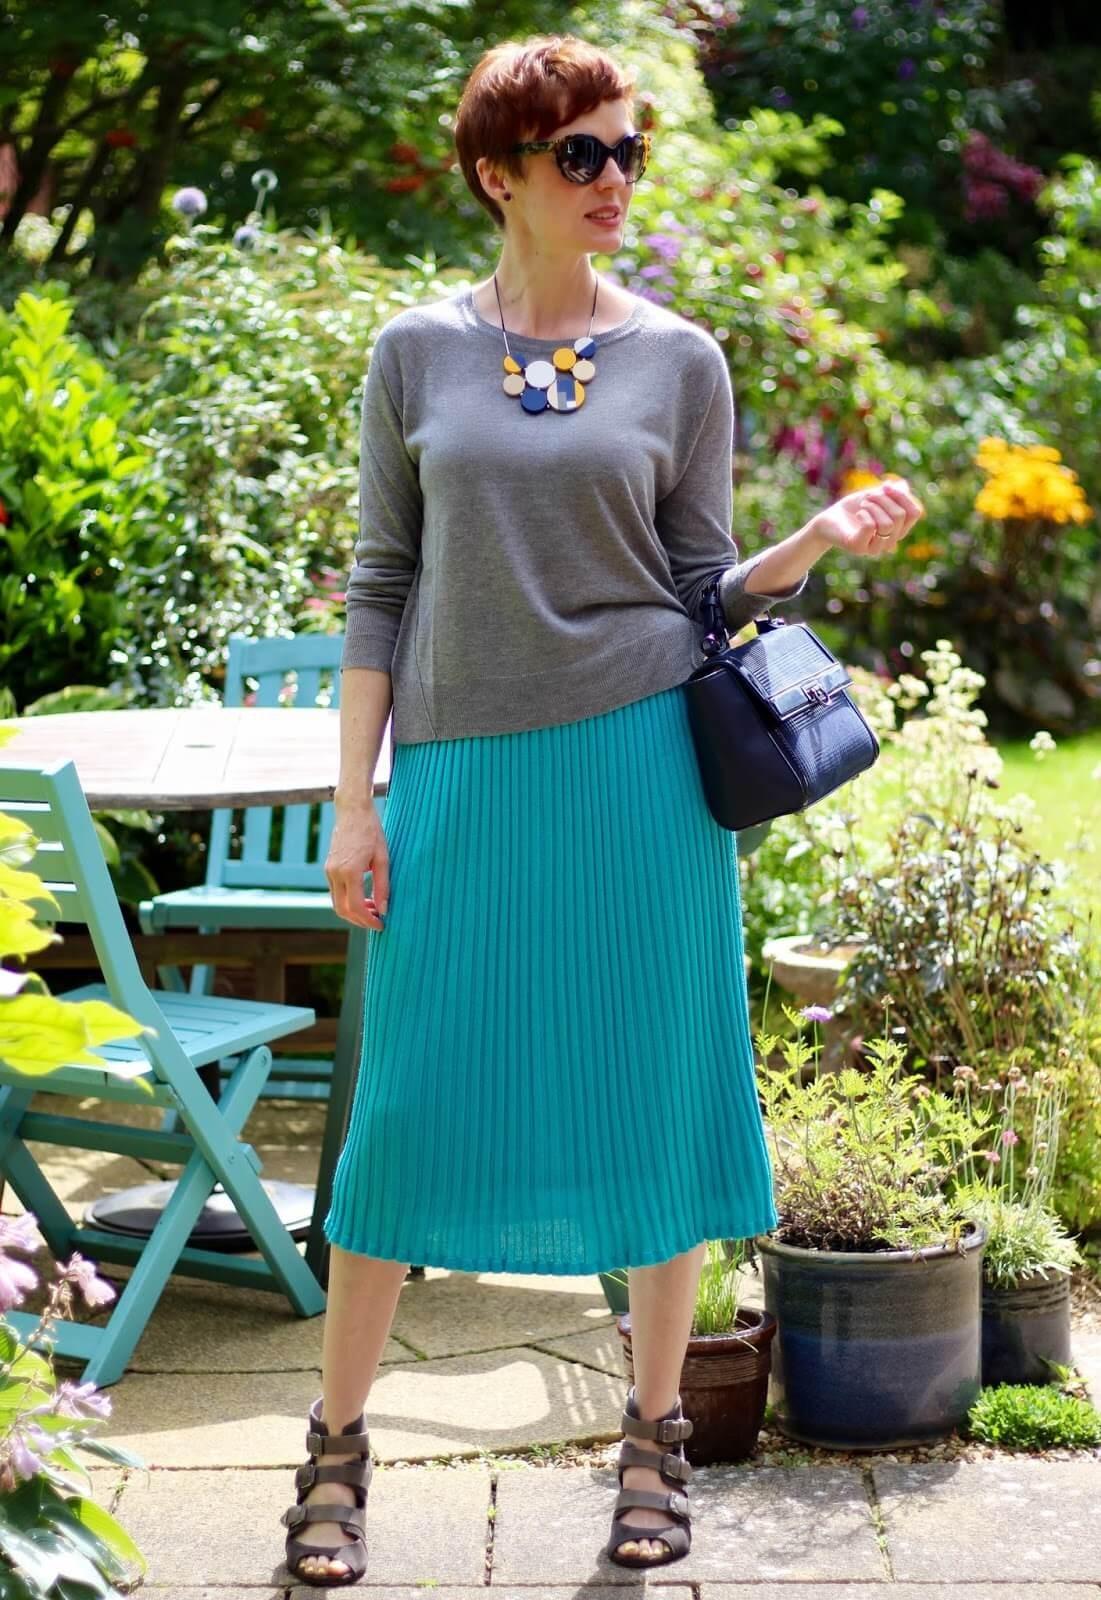 бирюзовая юбка и серый реглан